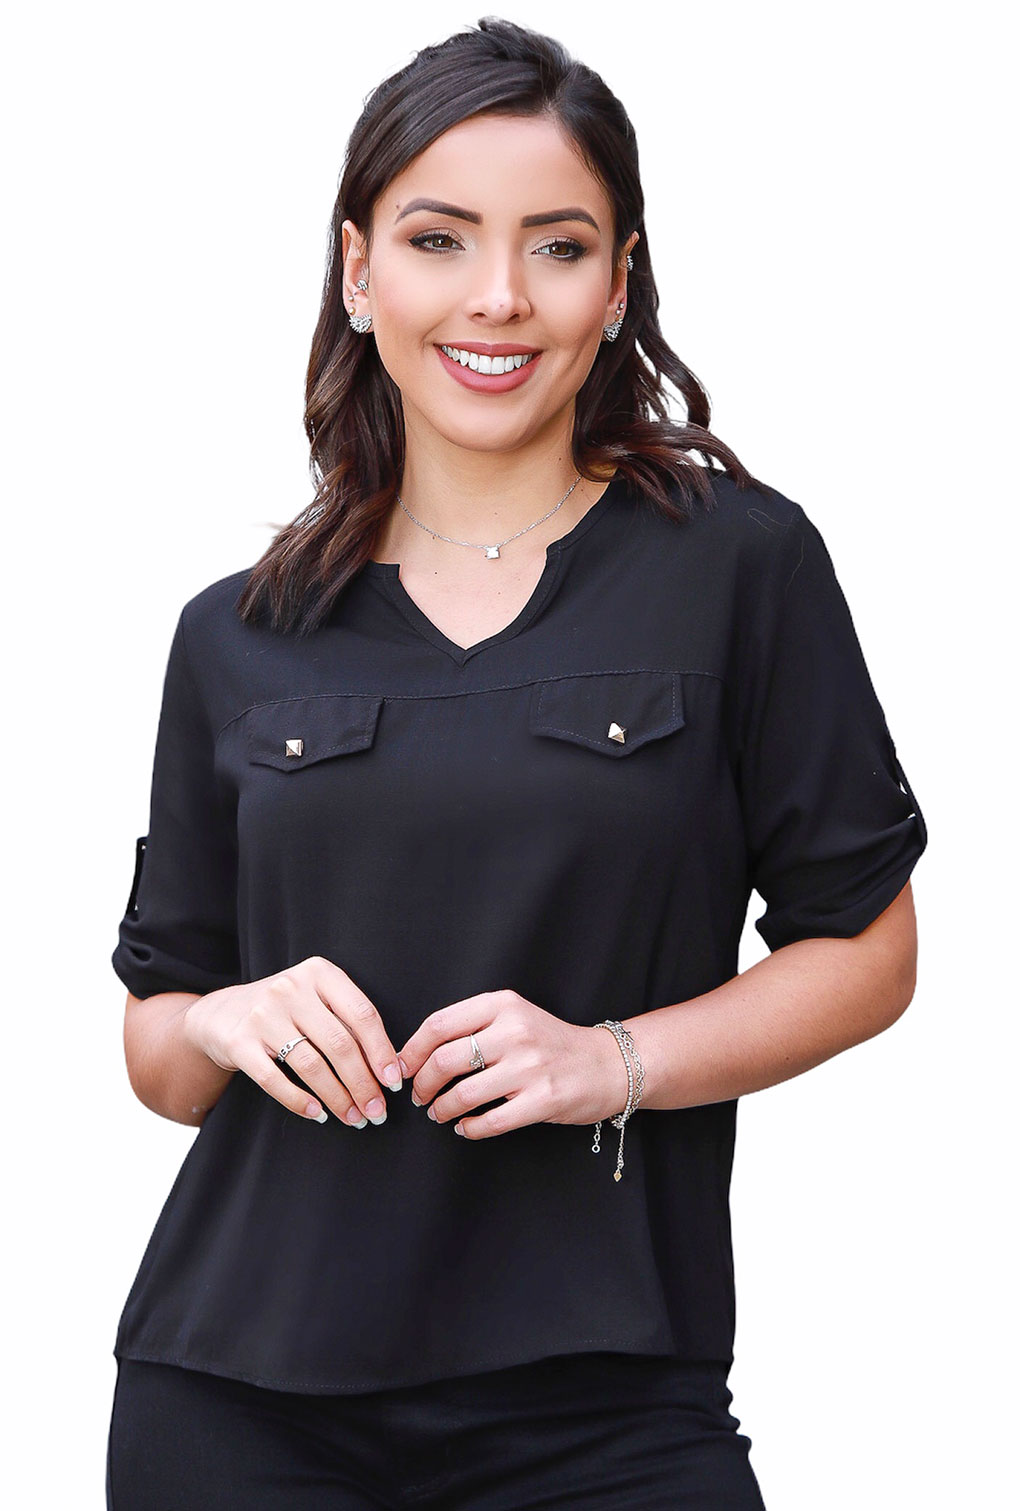 Camisa Blusa Feminina Manga Curta Social Lisa Preto  - ModaStore | Moda Feminina